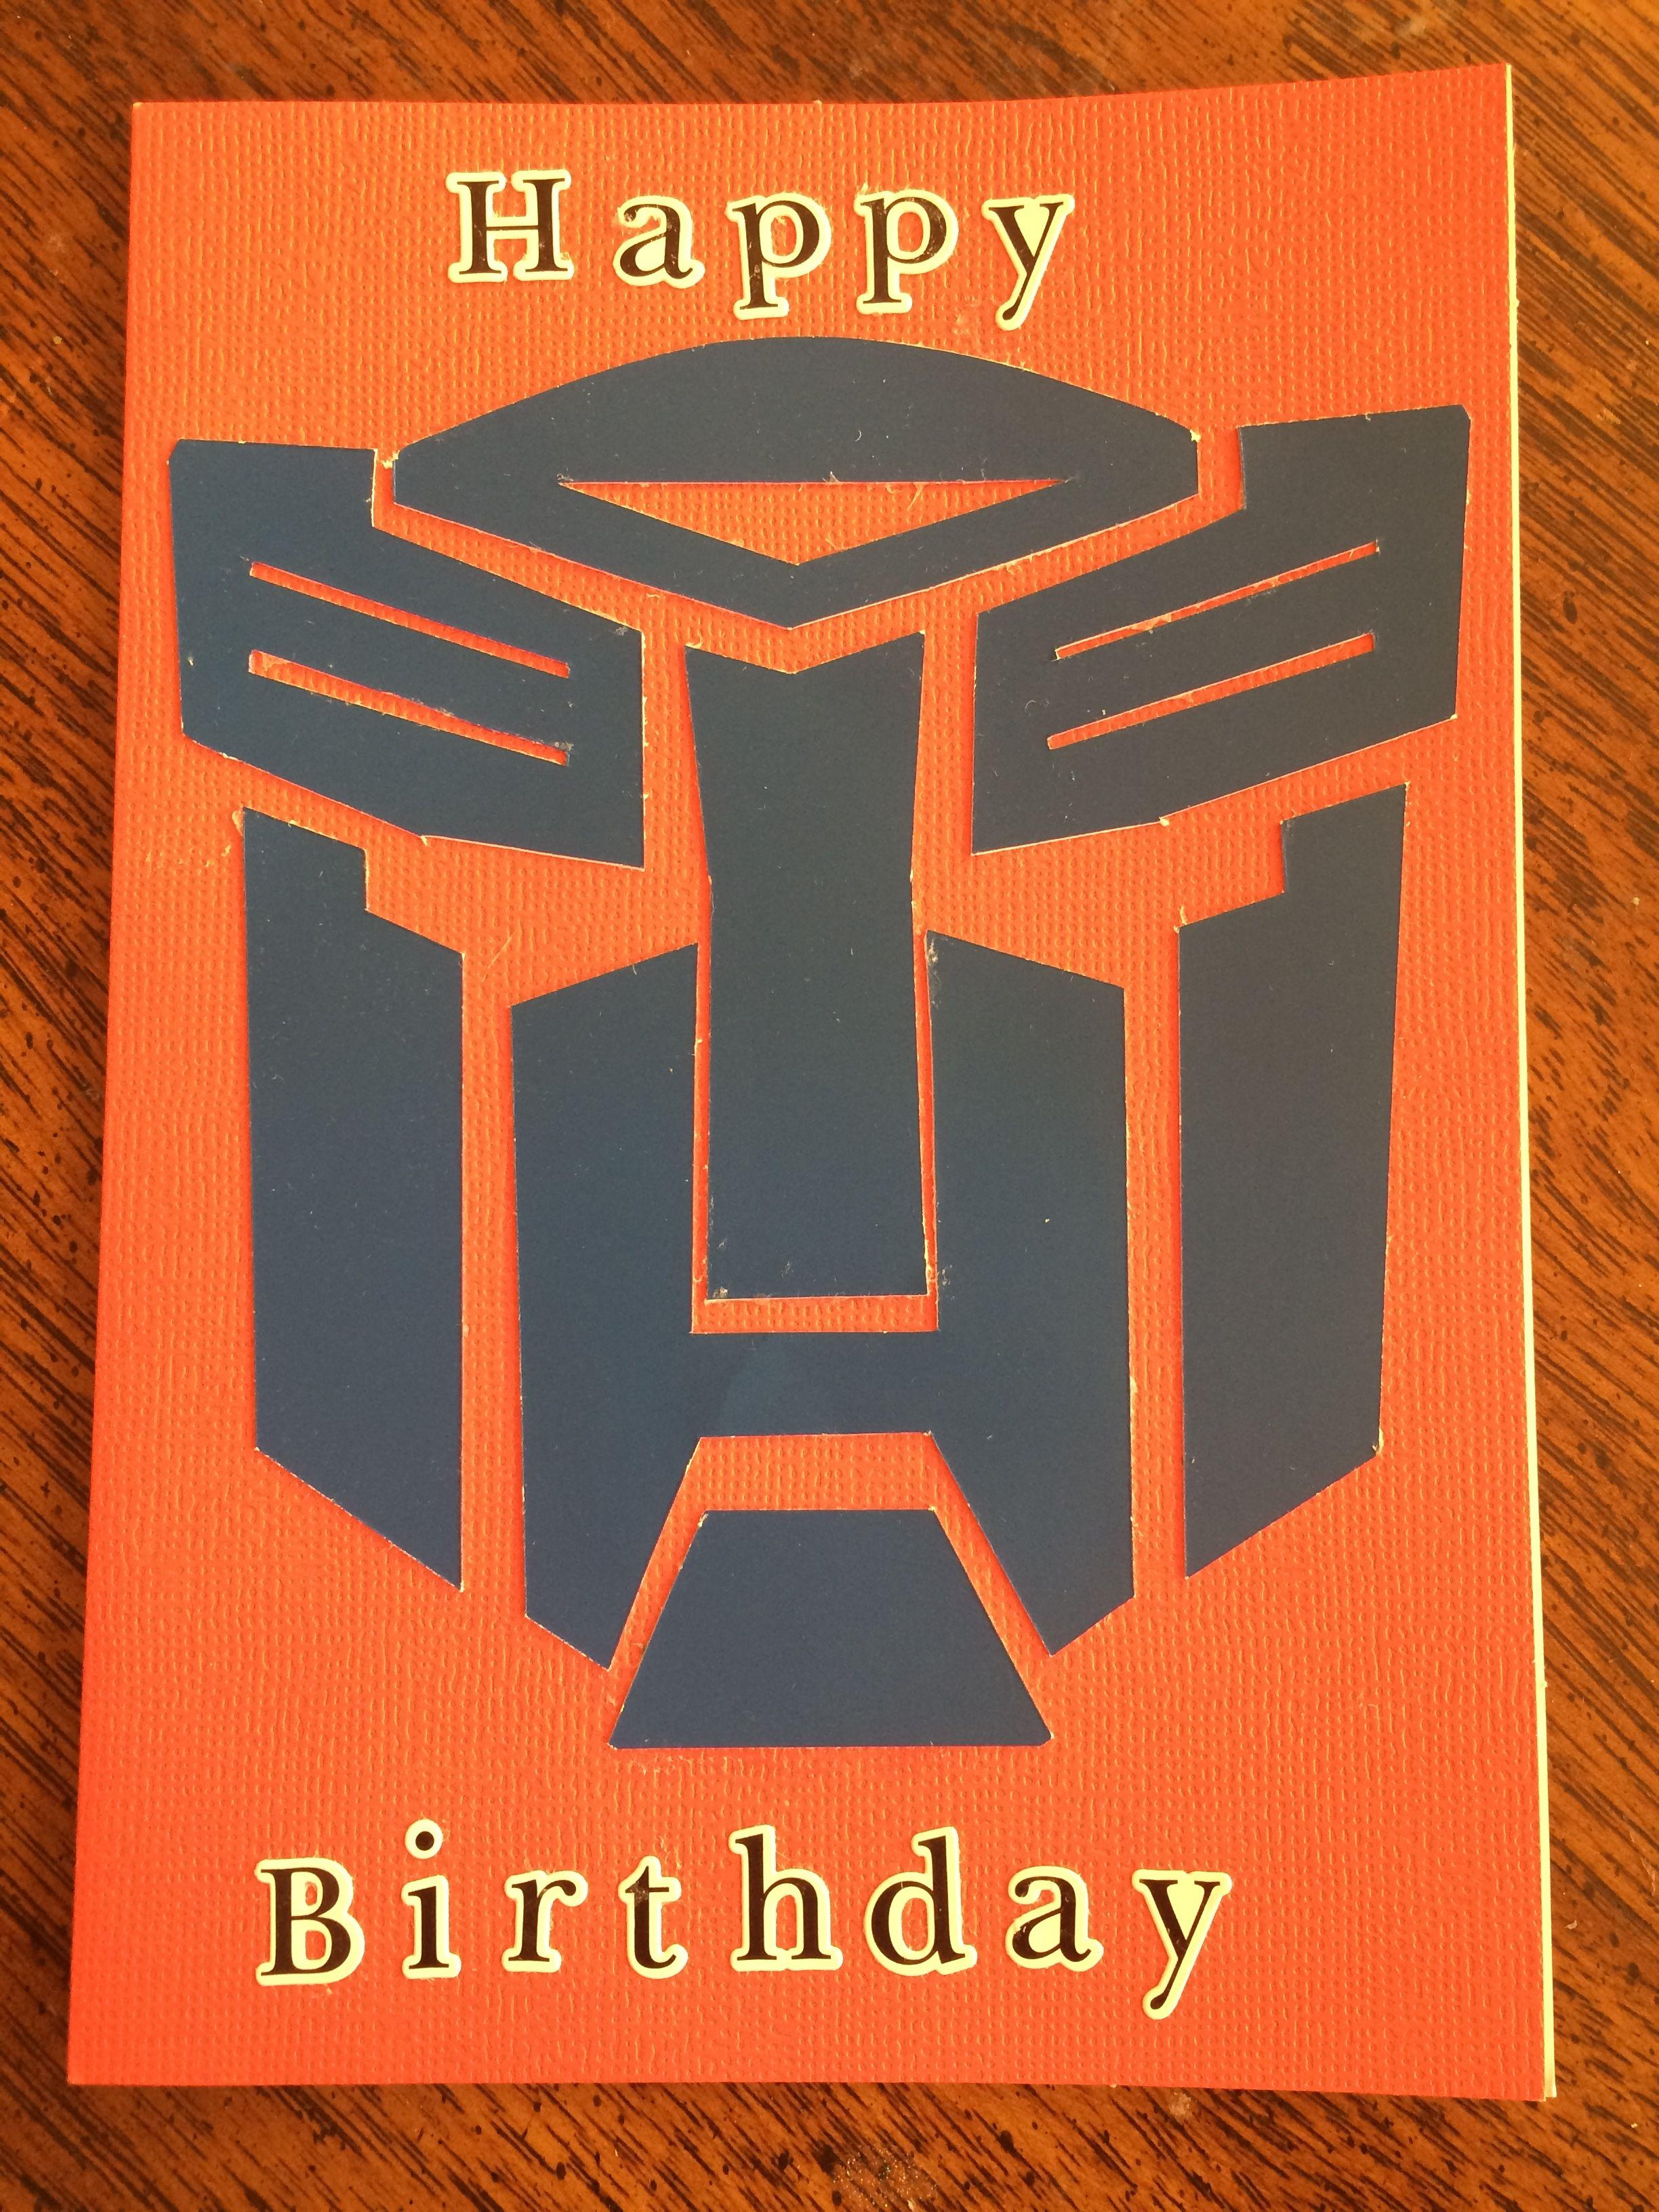 Transformers Birthday Card Cards Birthday Pinterest